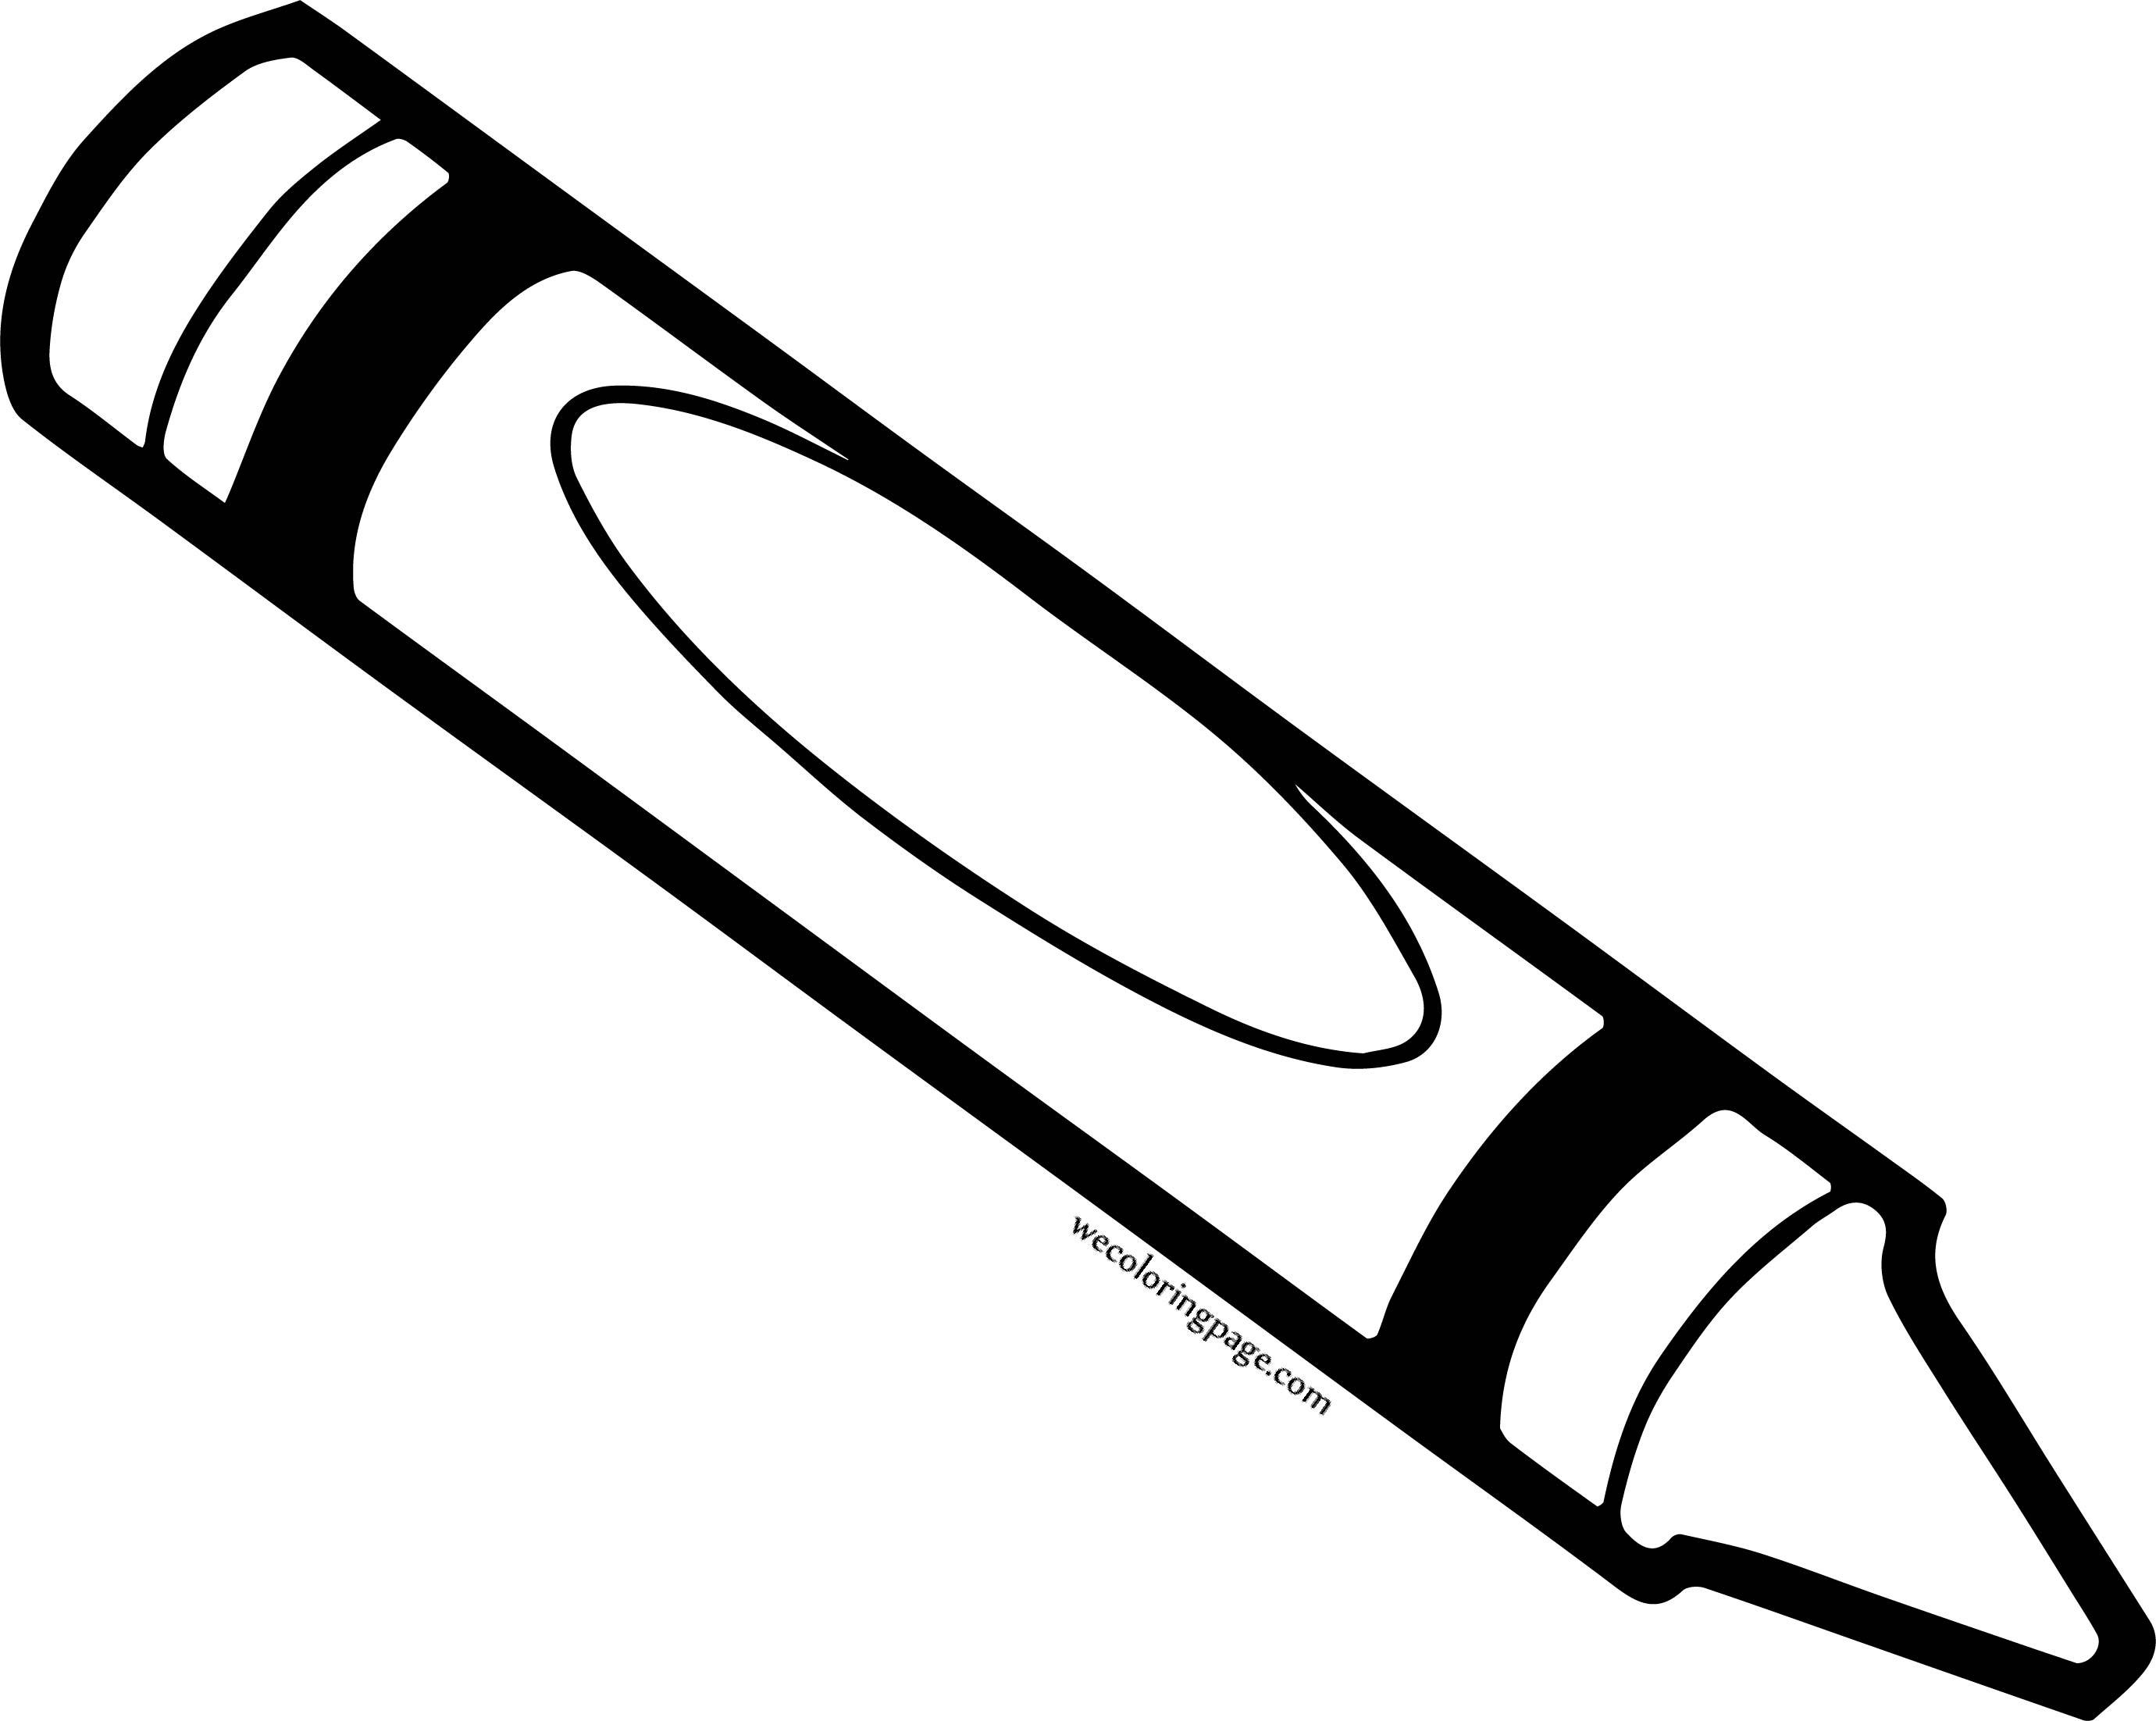 Crayon Pen Coloring Pages